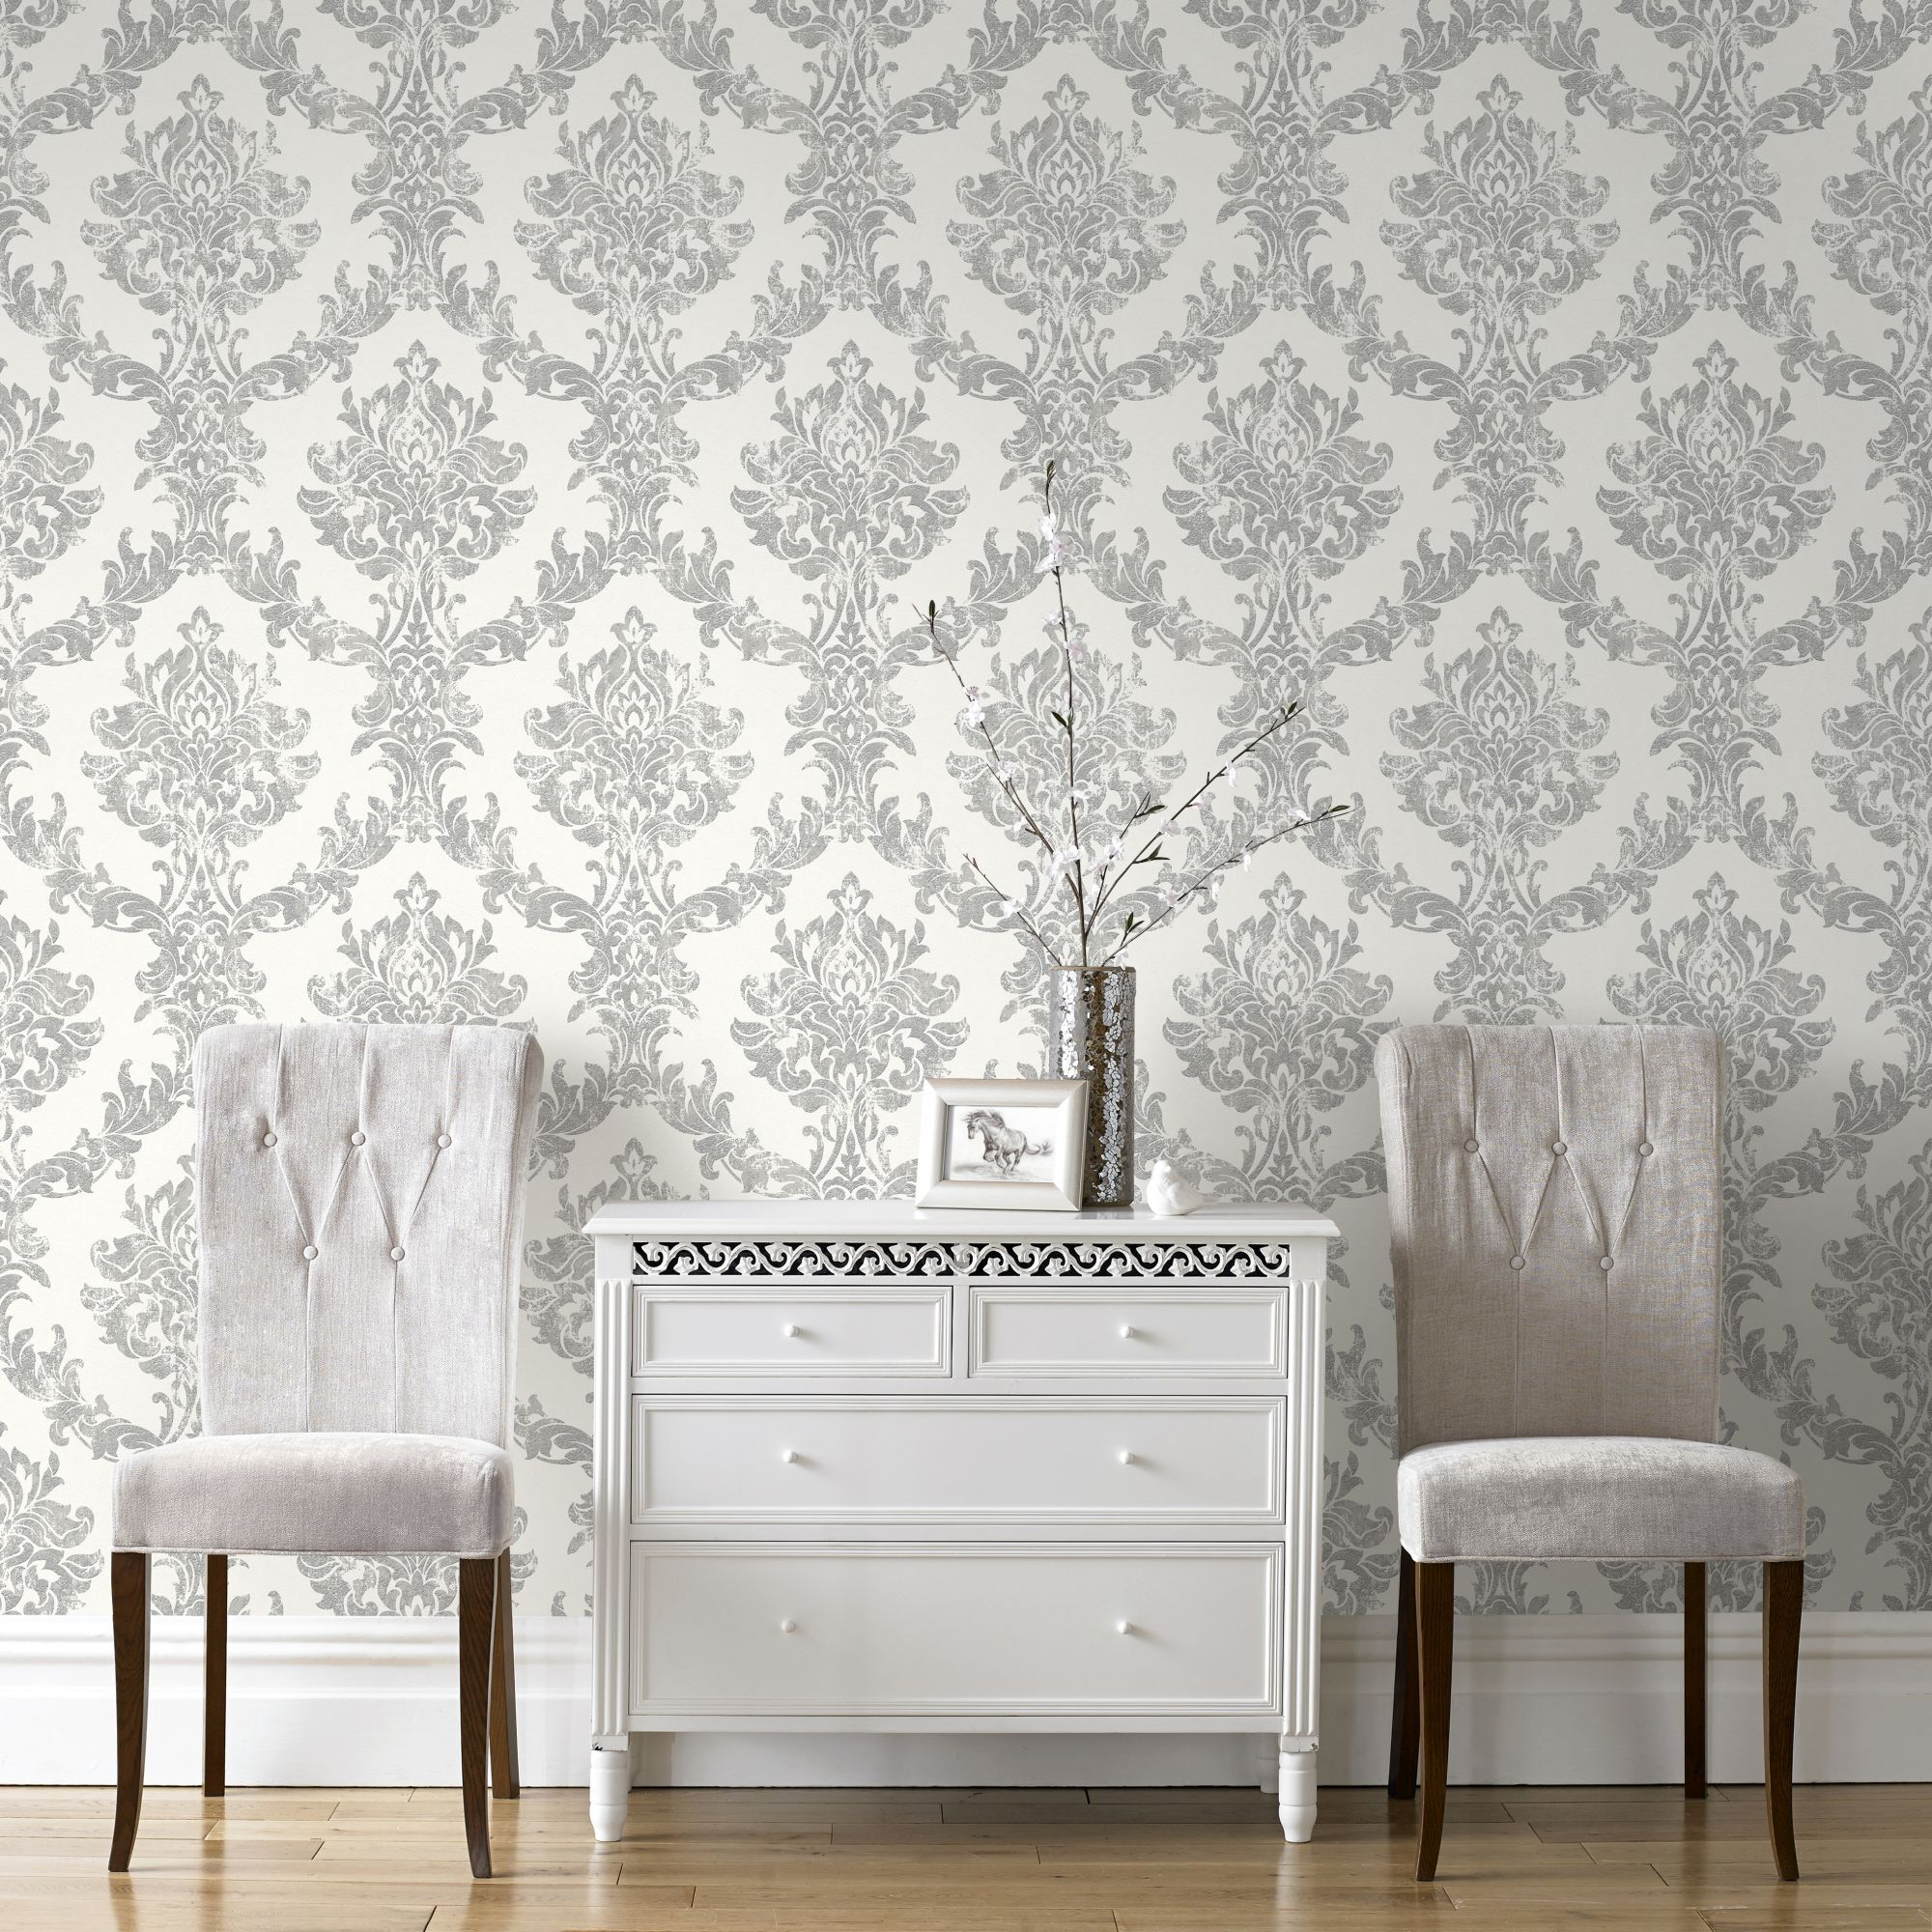 3d Brick Effect Home Depot Brick Wallpaper Opal Damask White And Silver Wallpaper Graham Amp Brown